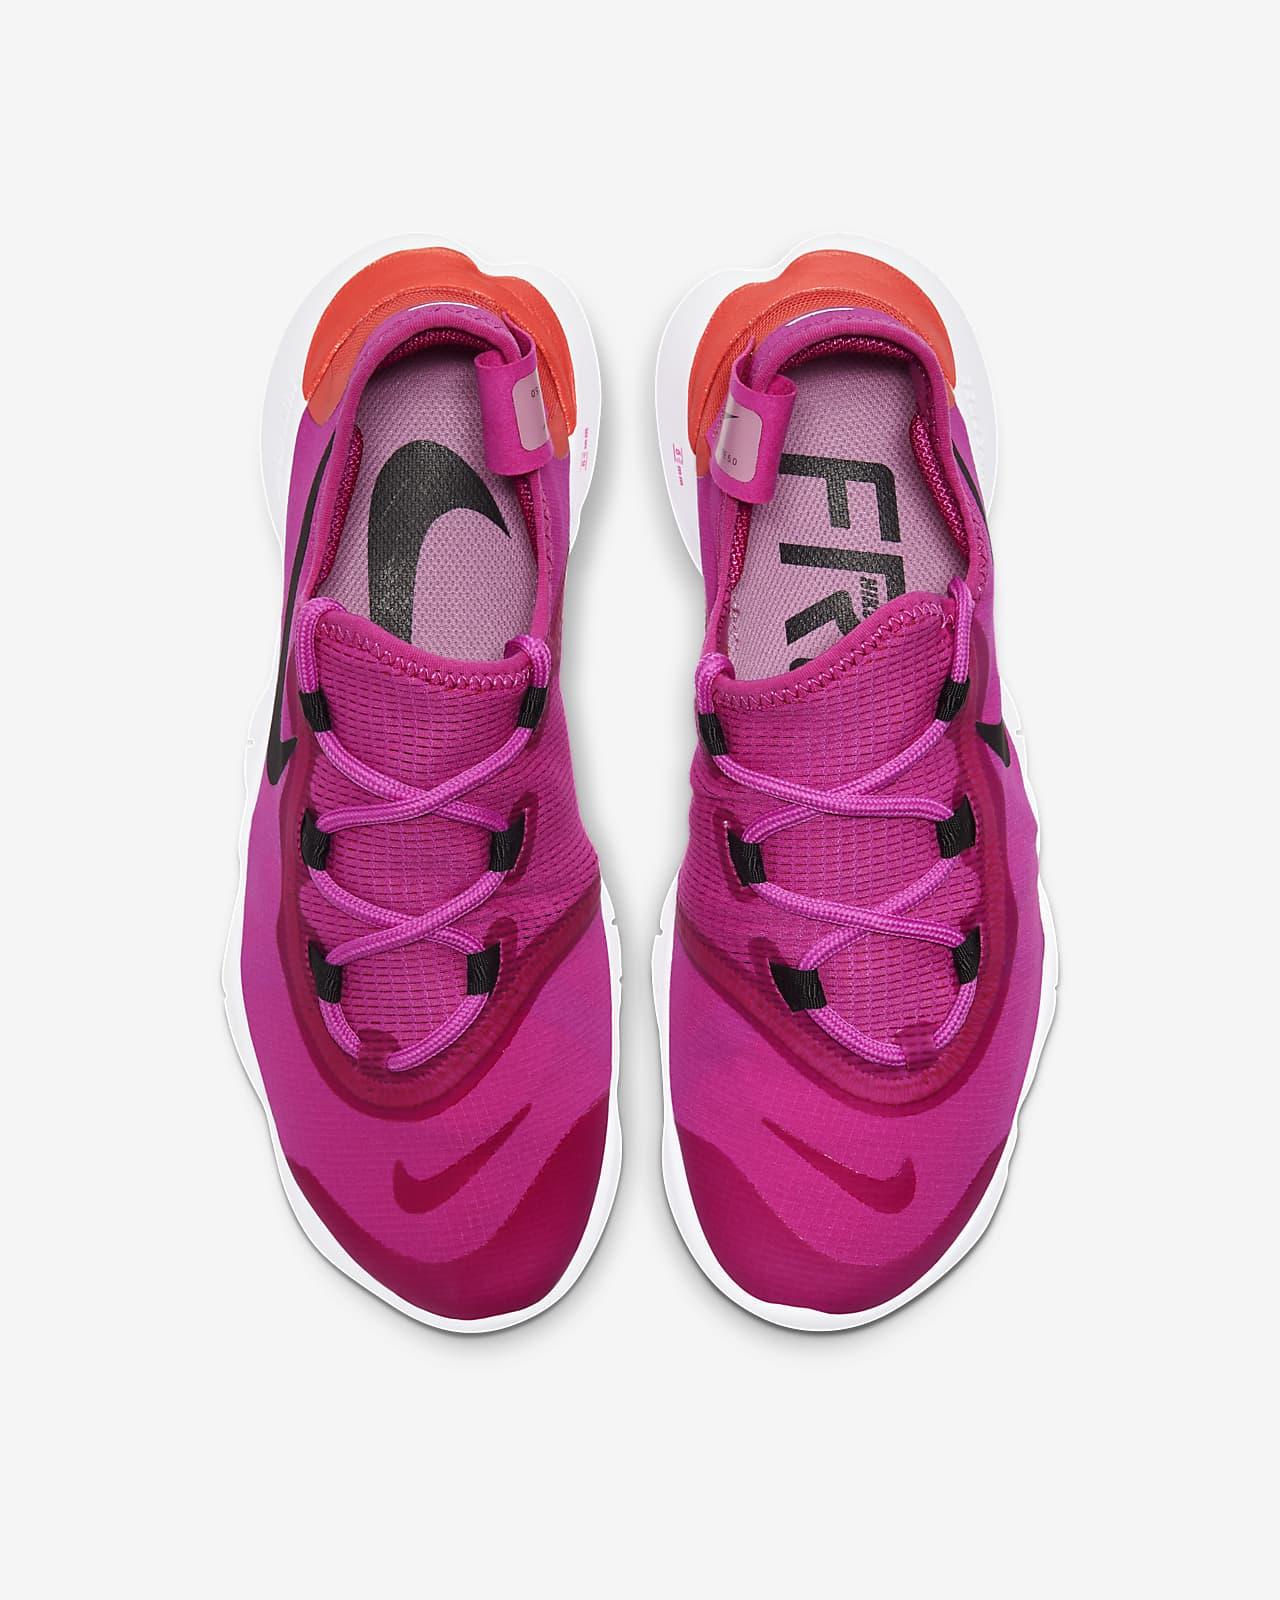 hipótesis Picasso accidente  Calzado de running para mujer Nike Free RN 5.0. Nike MX